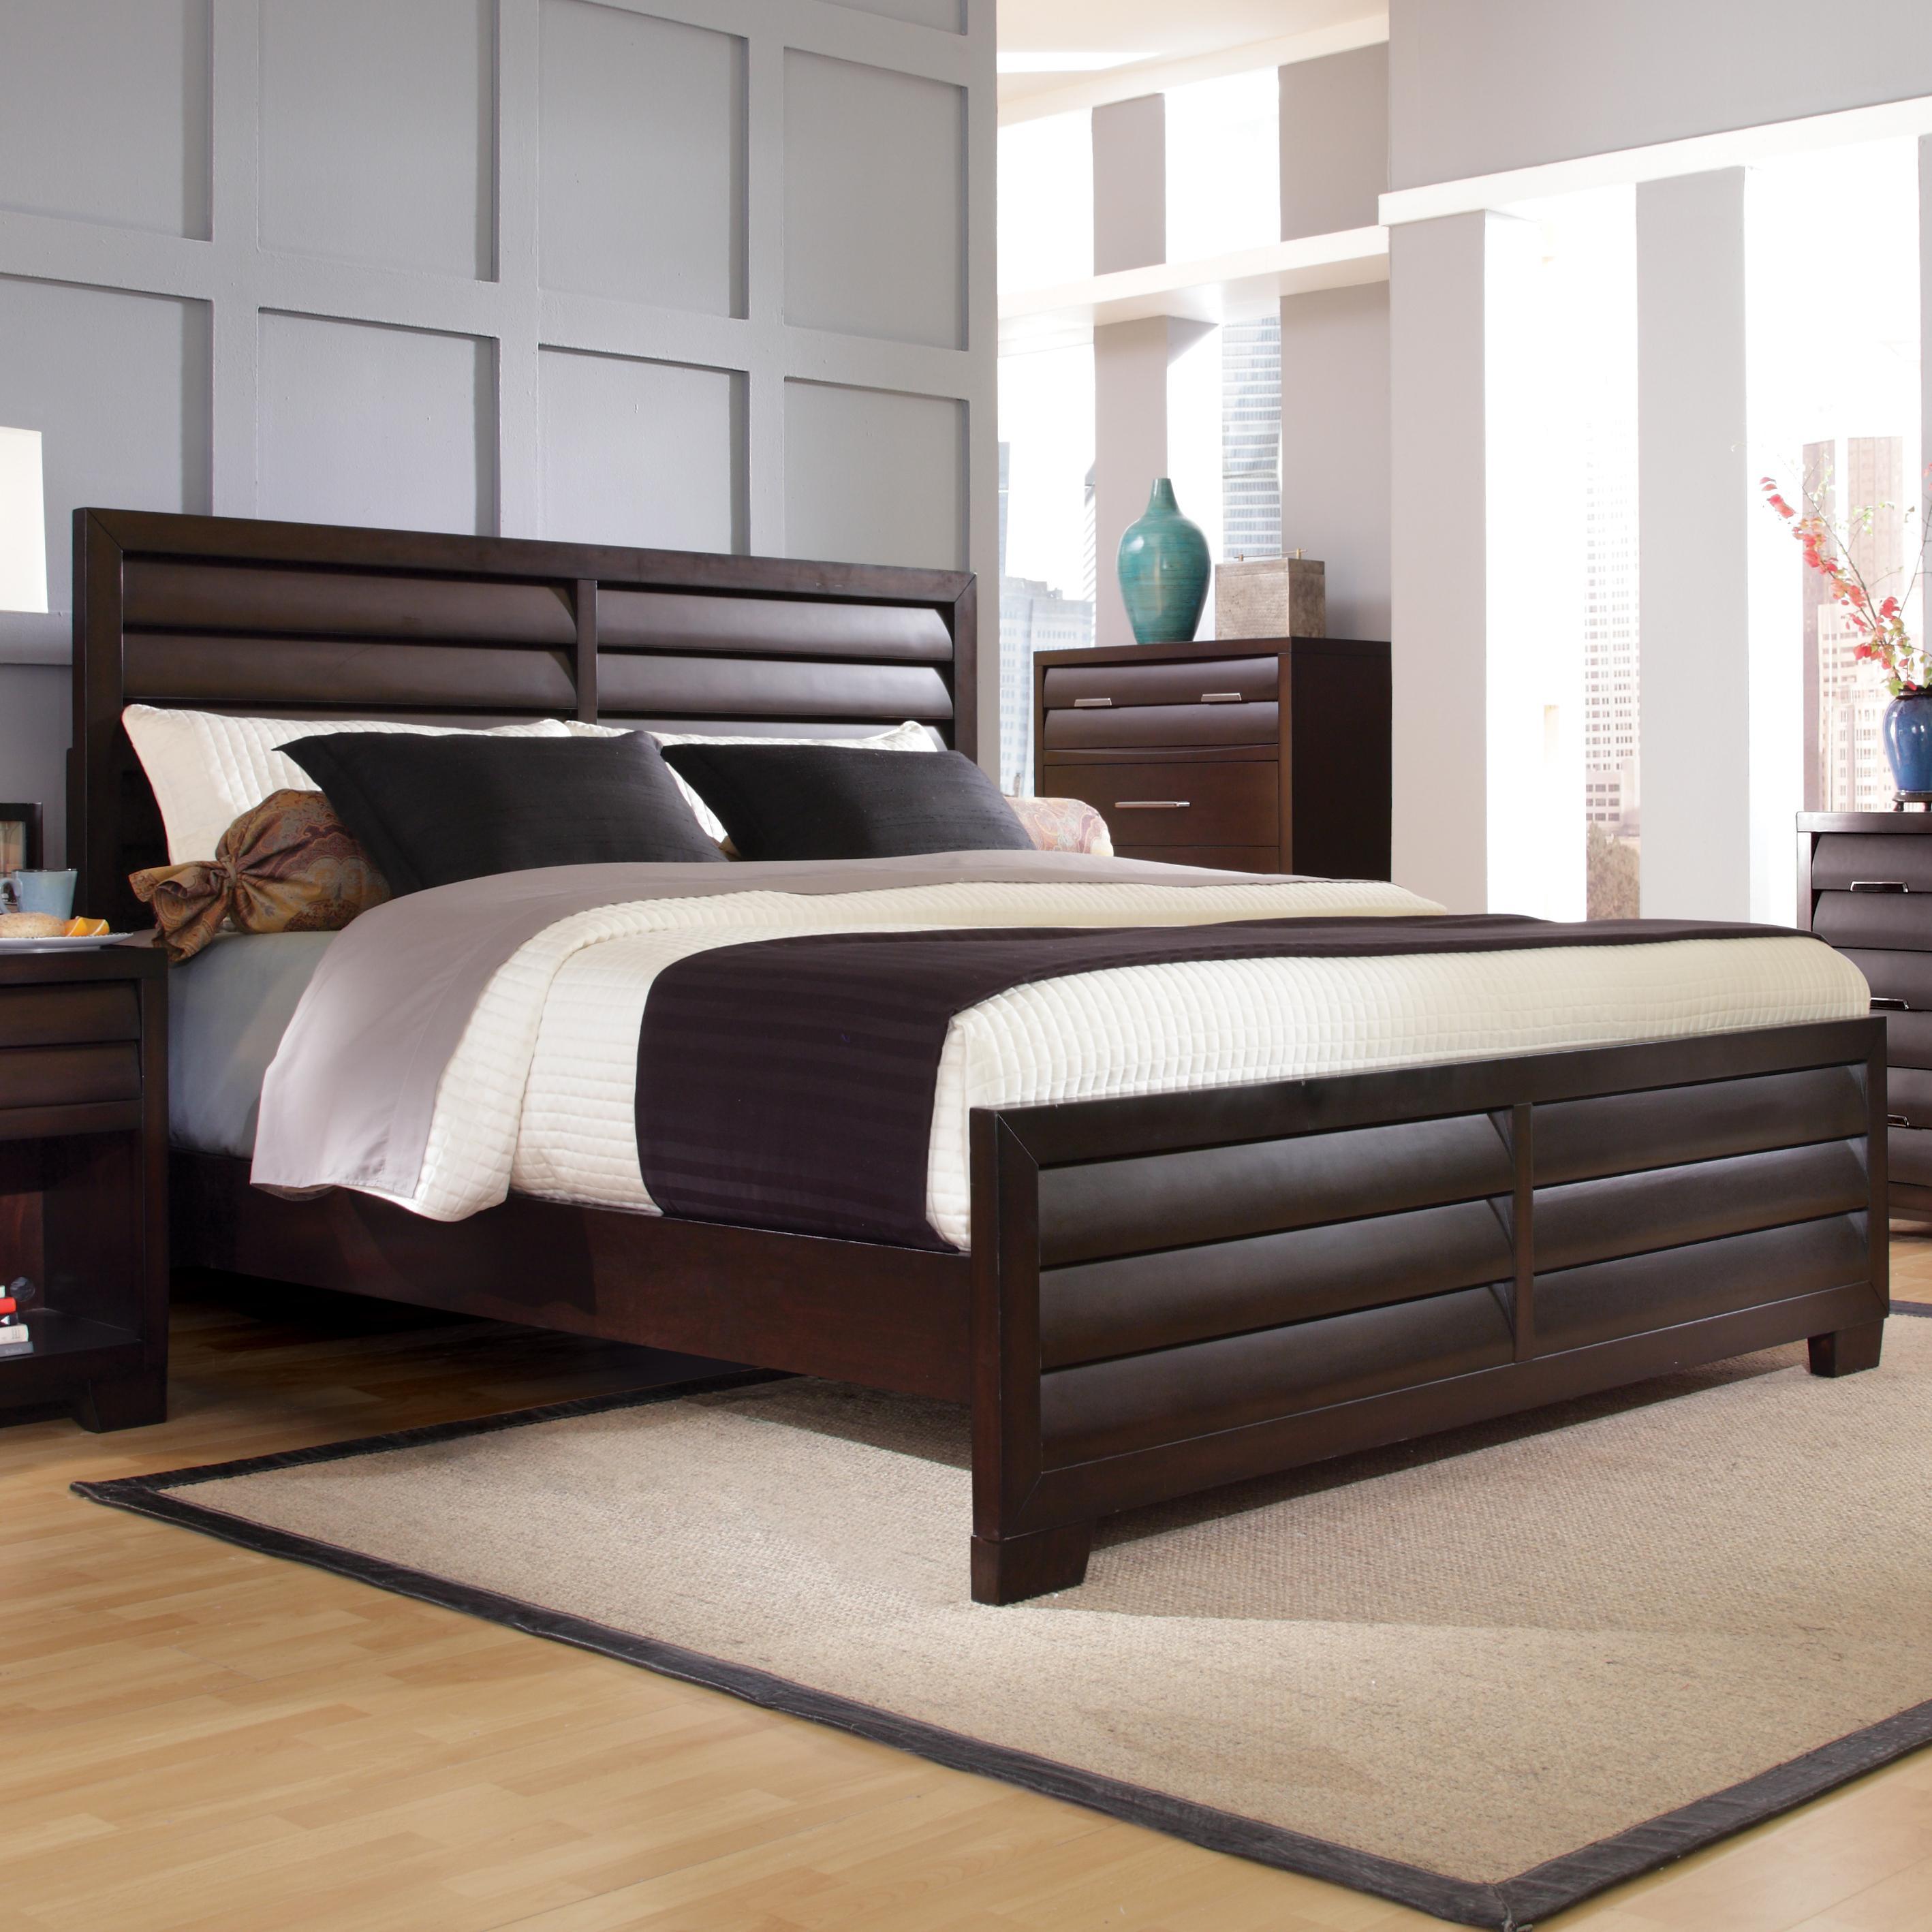 Pulaski Furniture Tangerine Queen Panel Bed Dream Home Furniture Headboard Footboard